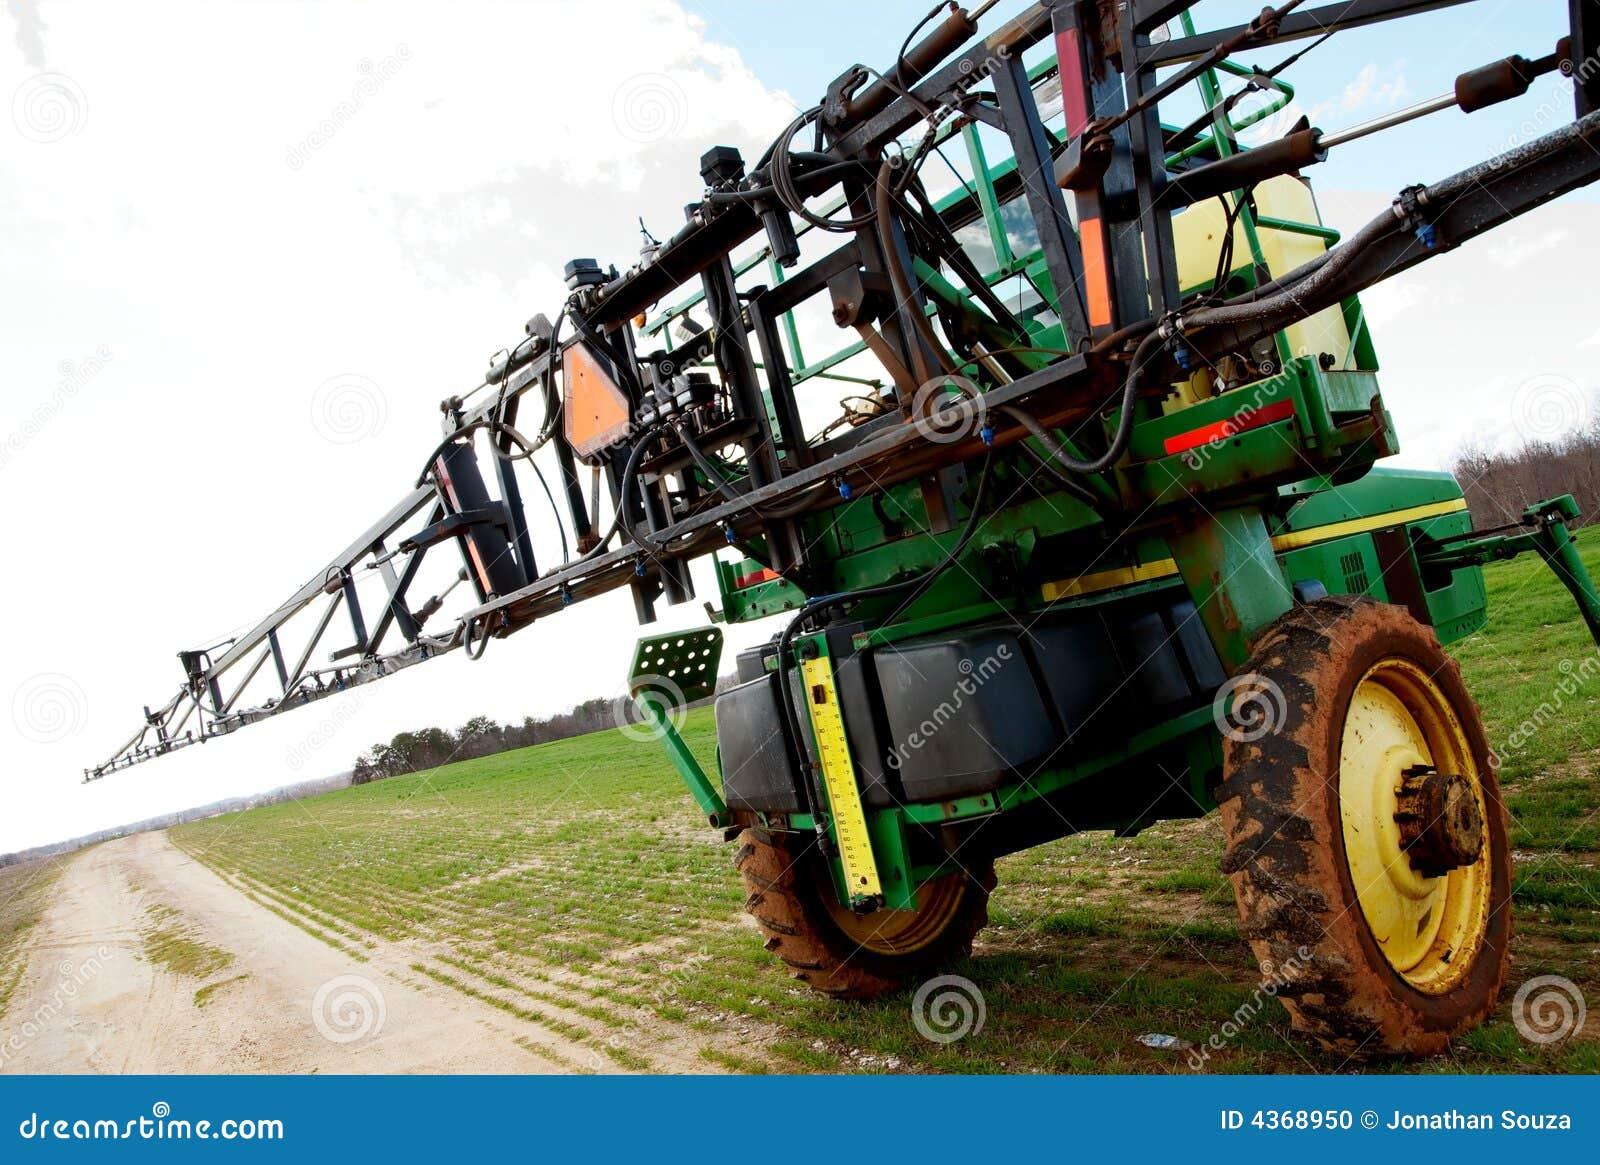 Tractor sprayer on open field 02